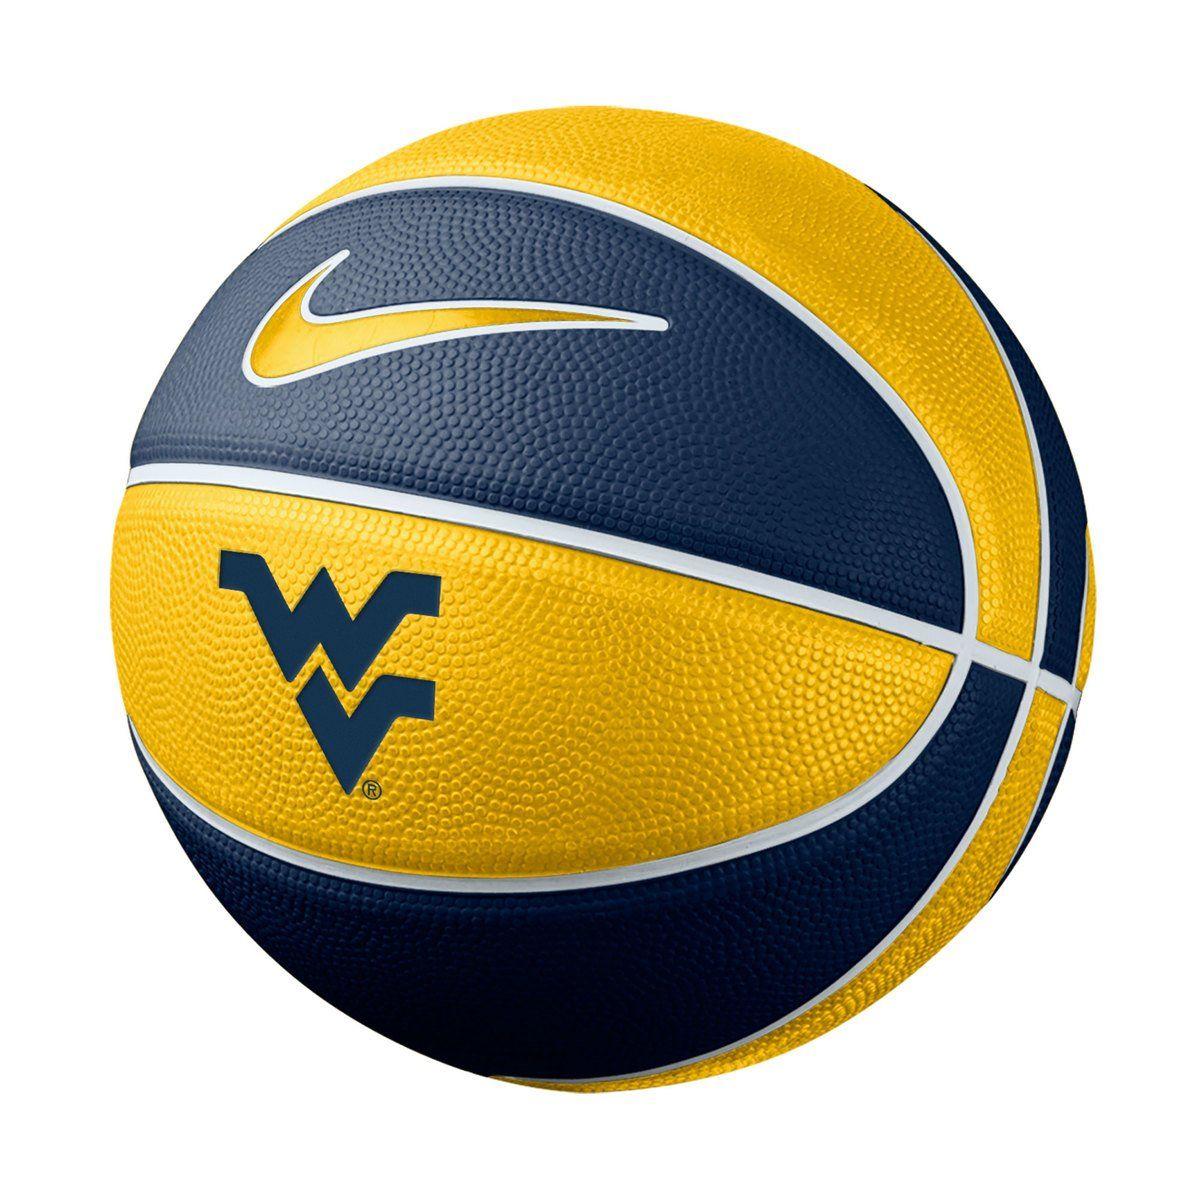 Nike WVU Training Rubber Basketball West virginia